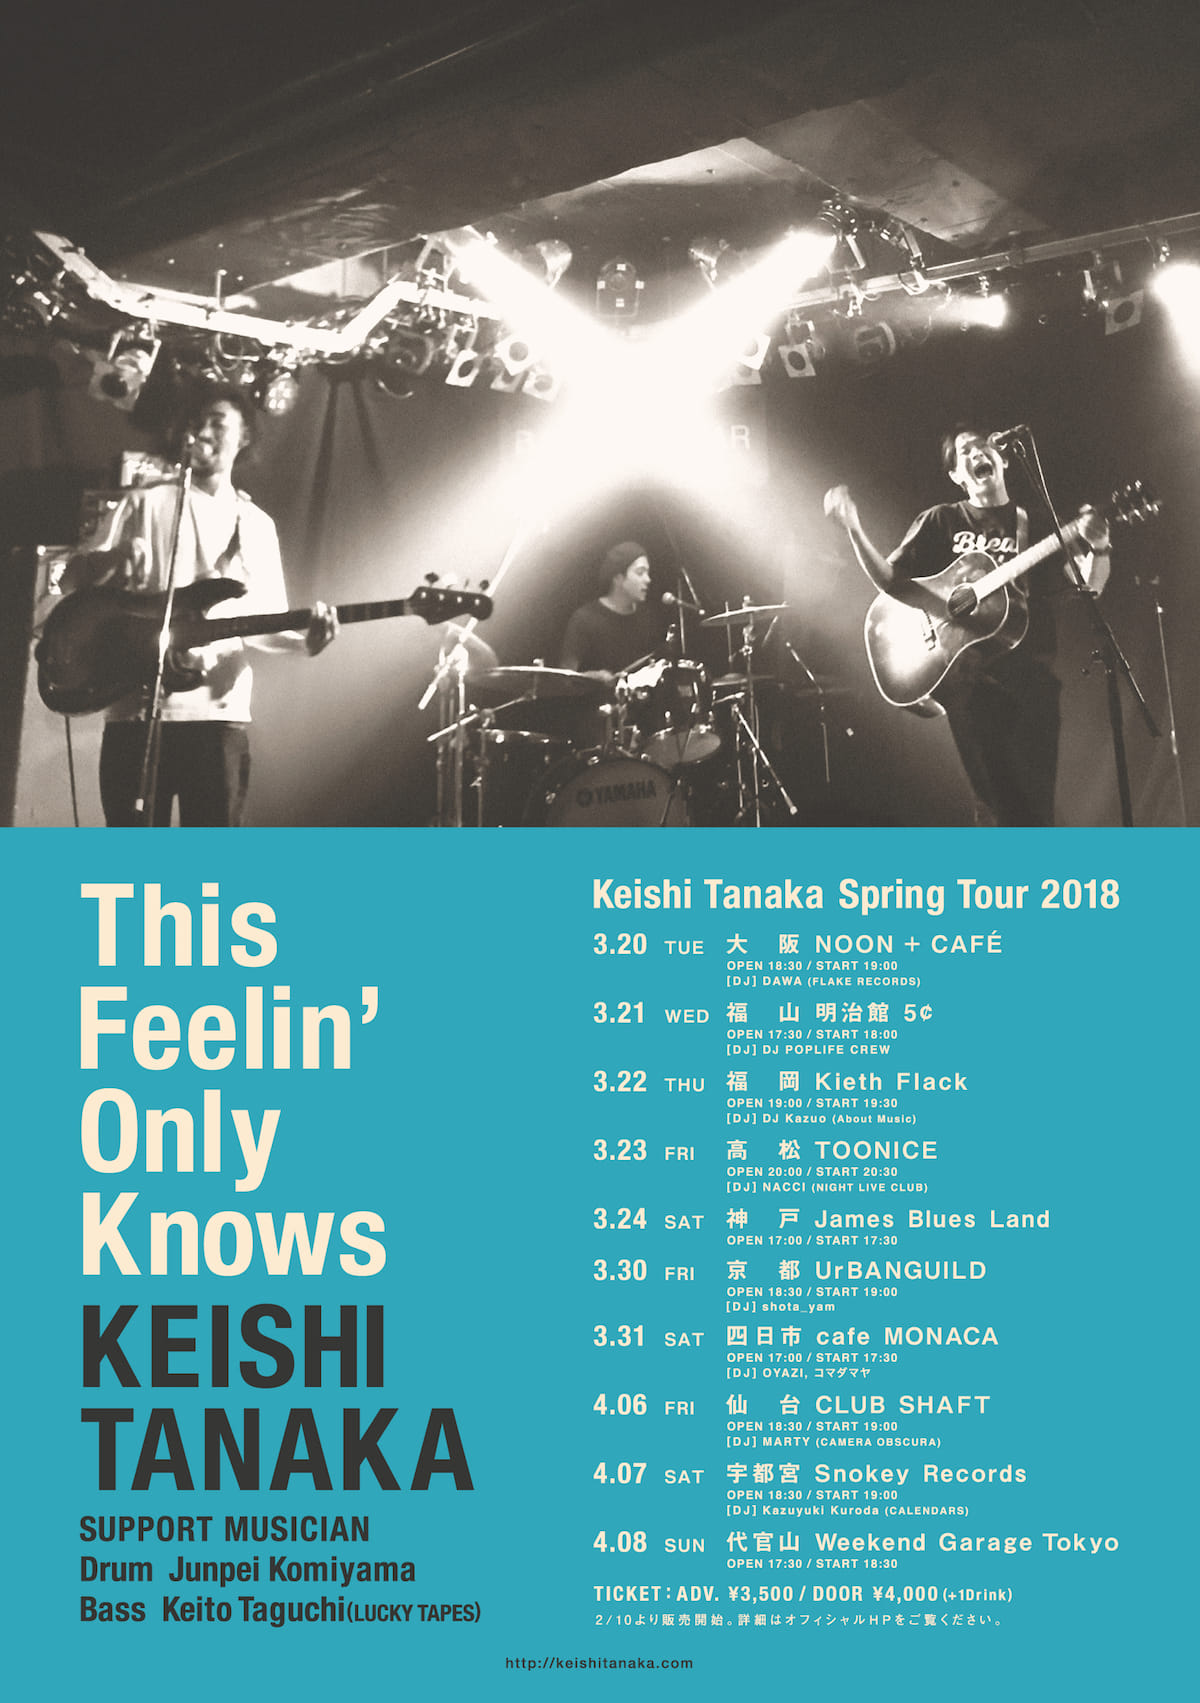 Keishi Tanaka、新曲「This Feelin' Only Knows」のMVを公開!ツアー会場で12インチアナログ盤リリース! music180319_keishitanaka_2-1200x1703